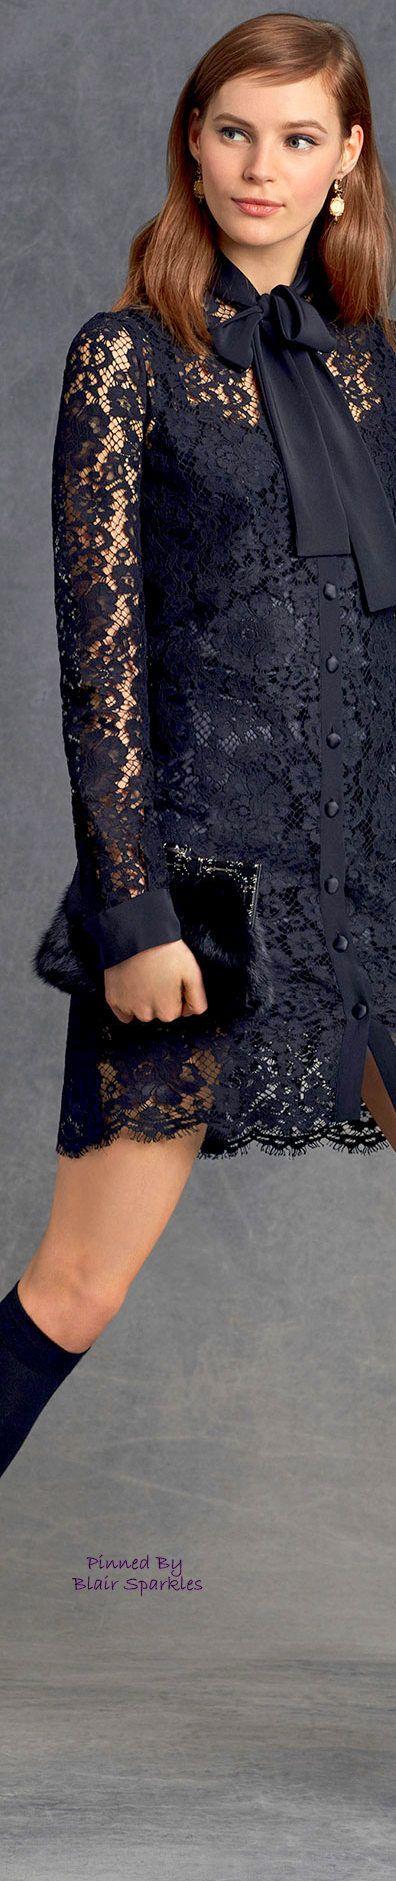 DOLCE AND GABBANA WINTER 2016 ♕♚εїз | BLAIR SPARKLES |